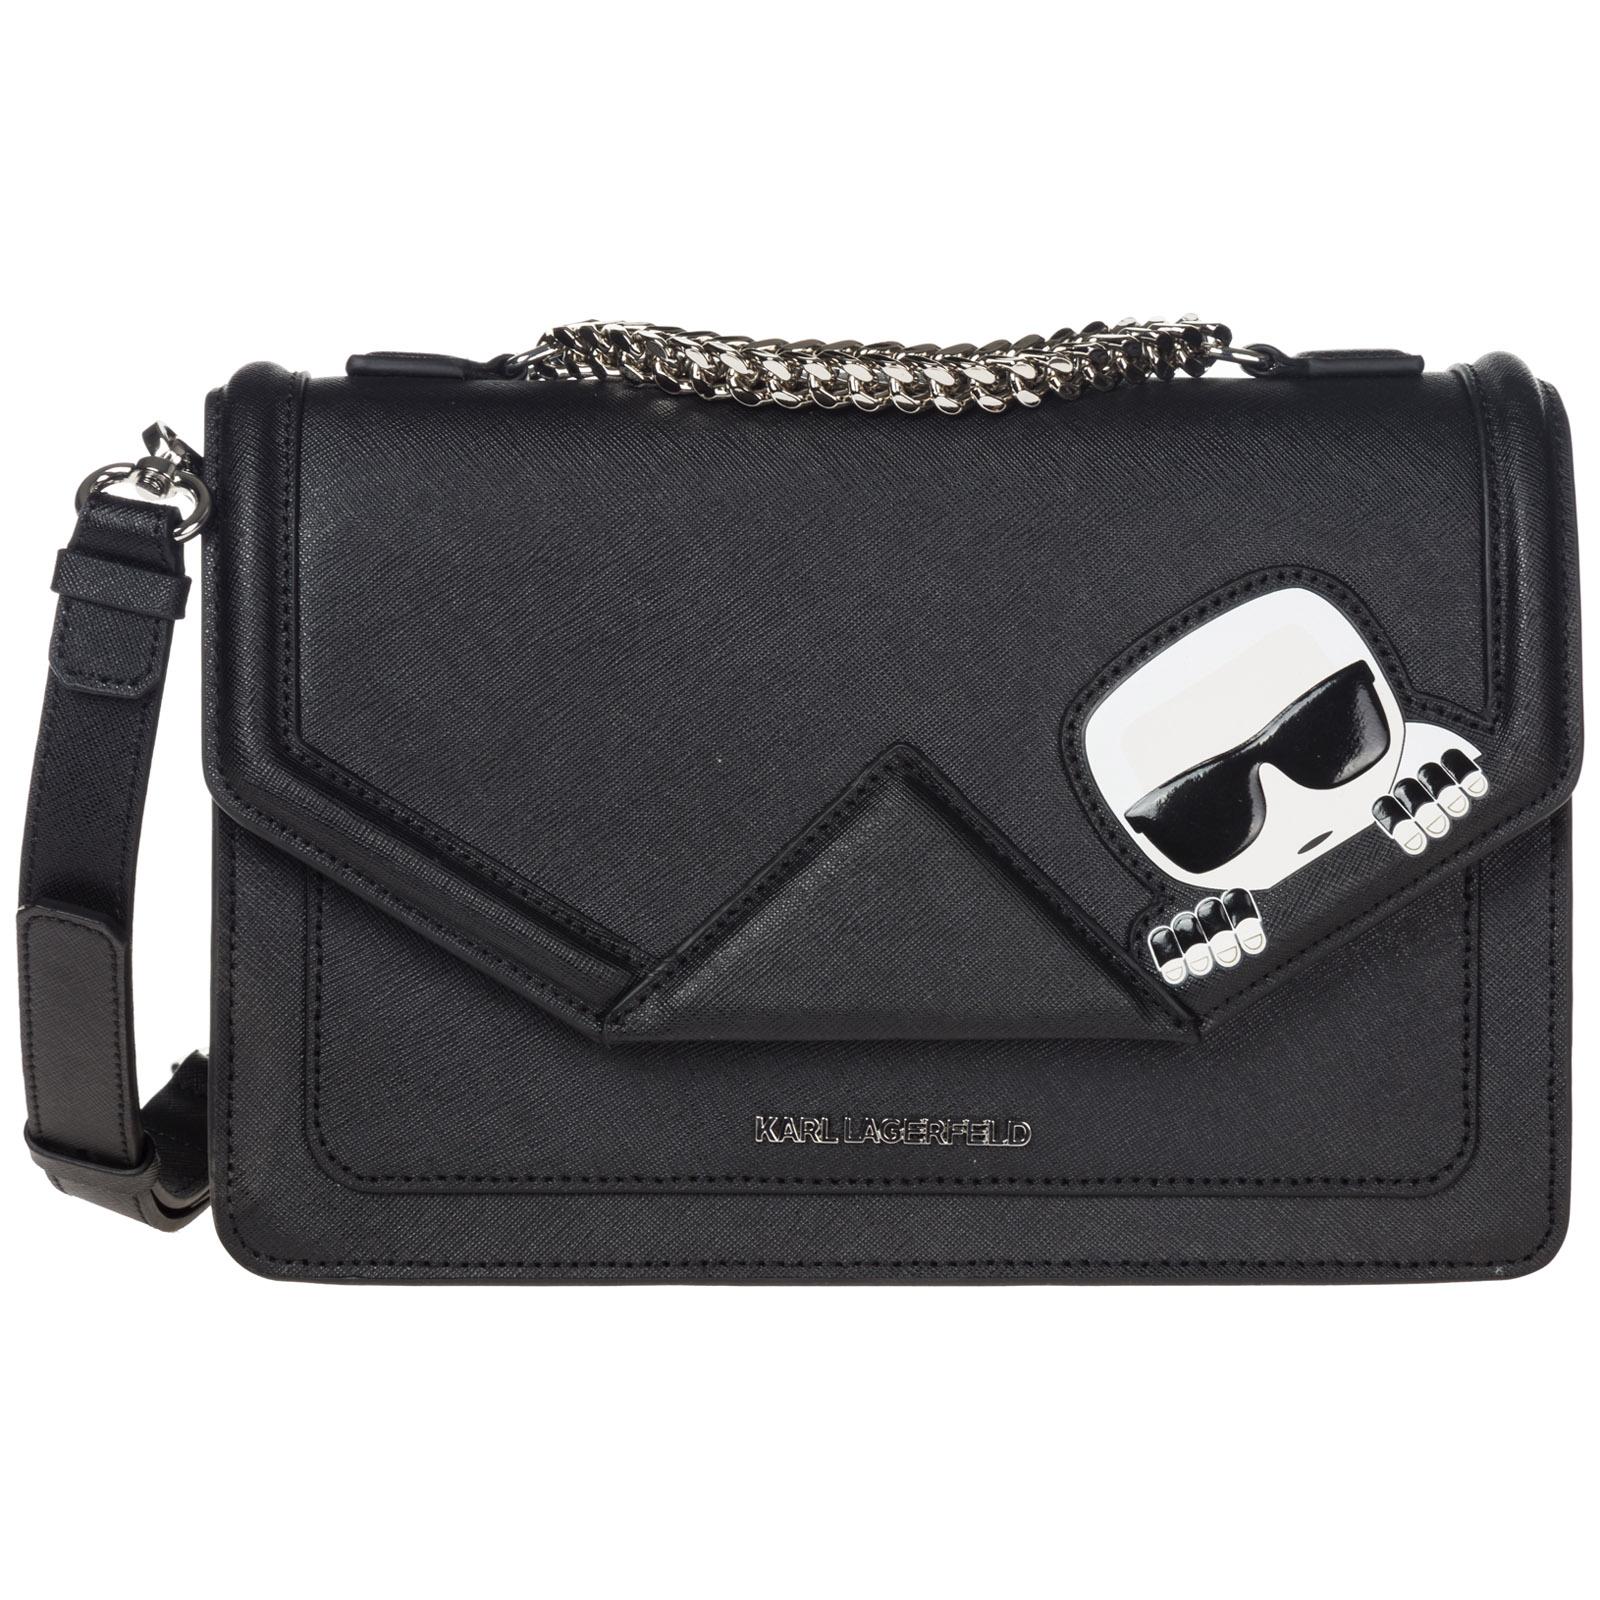 7ca4c6189aba Karl Lagerfeld Women s handbag shopping bag purse tote k ikonik